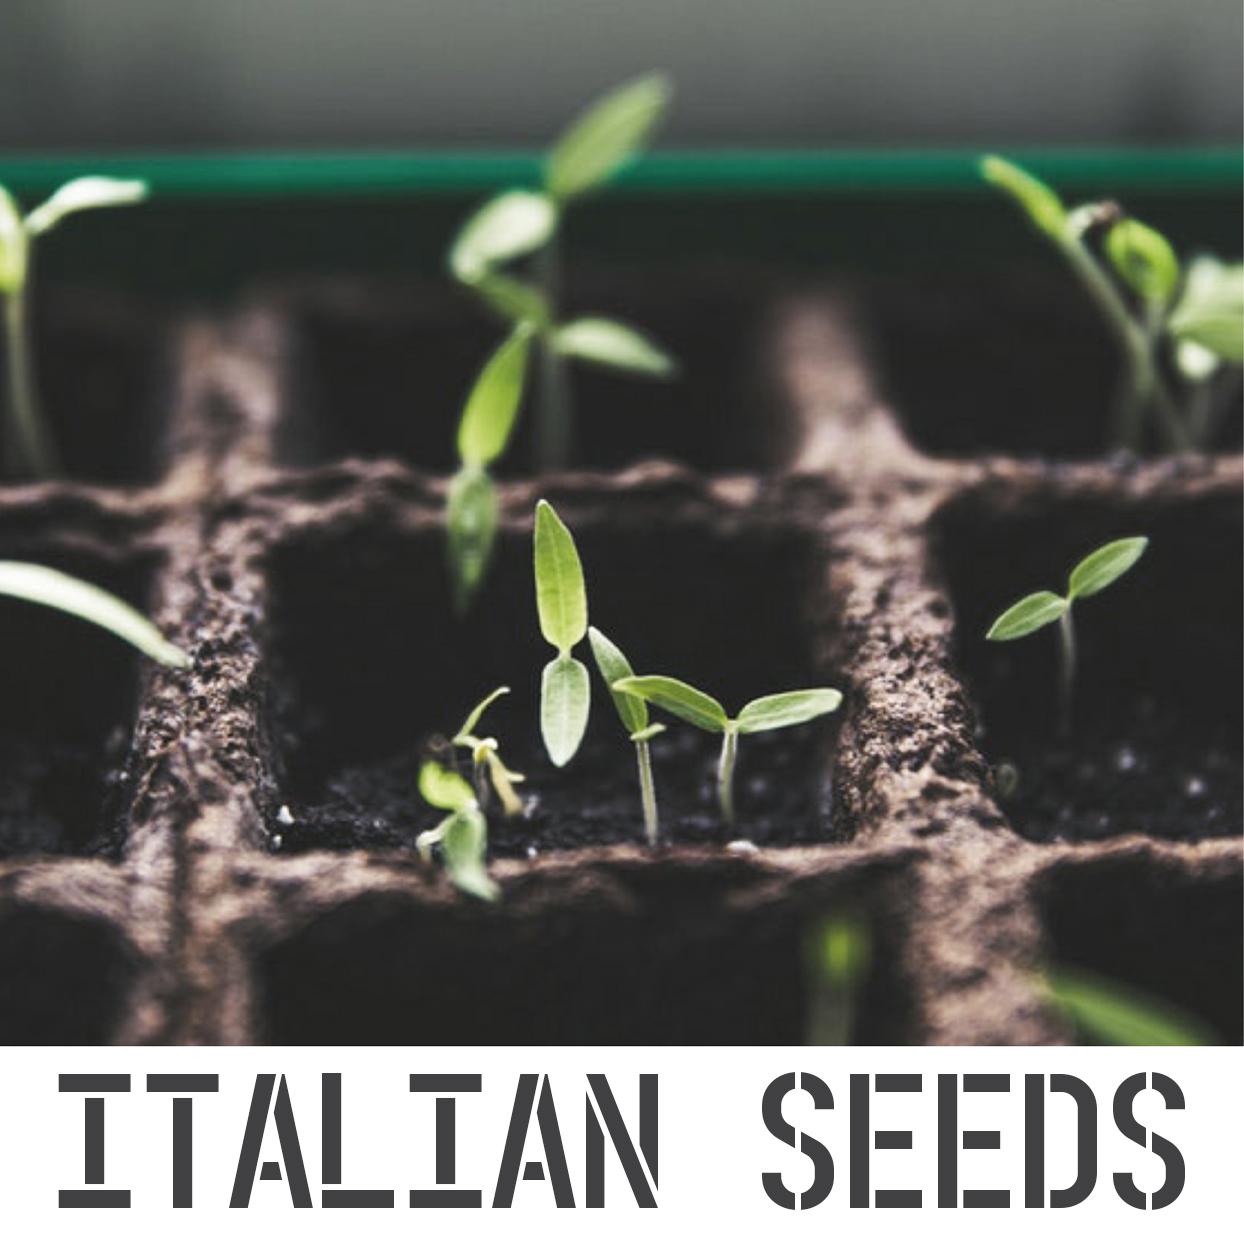 ITALIAN SEEDS R.jpg